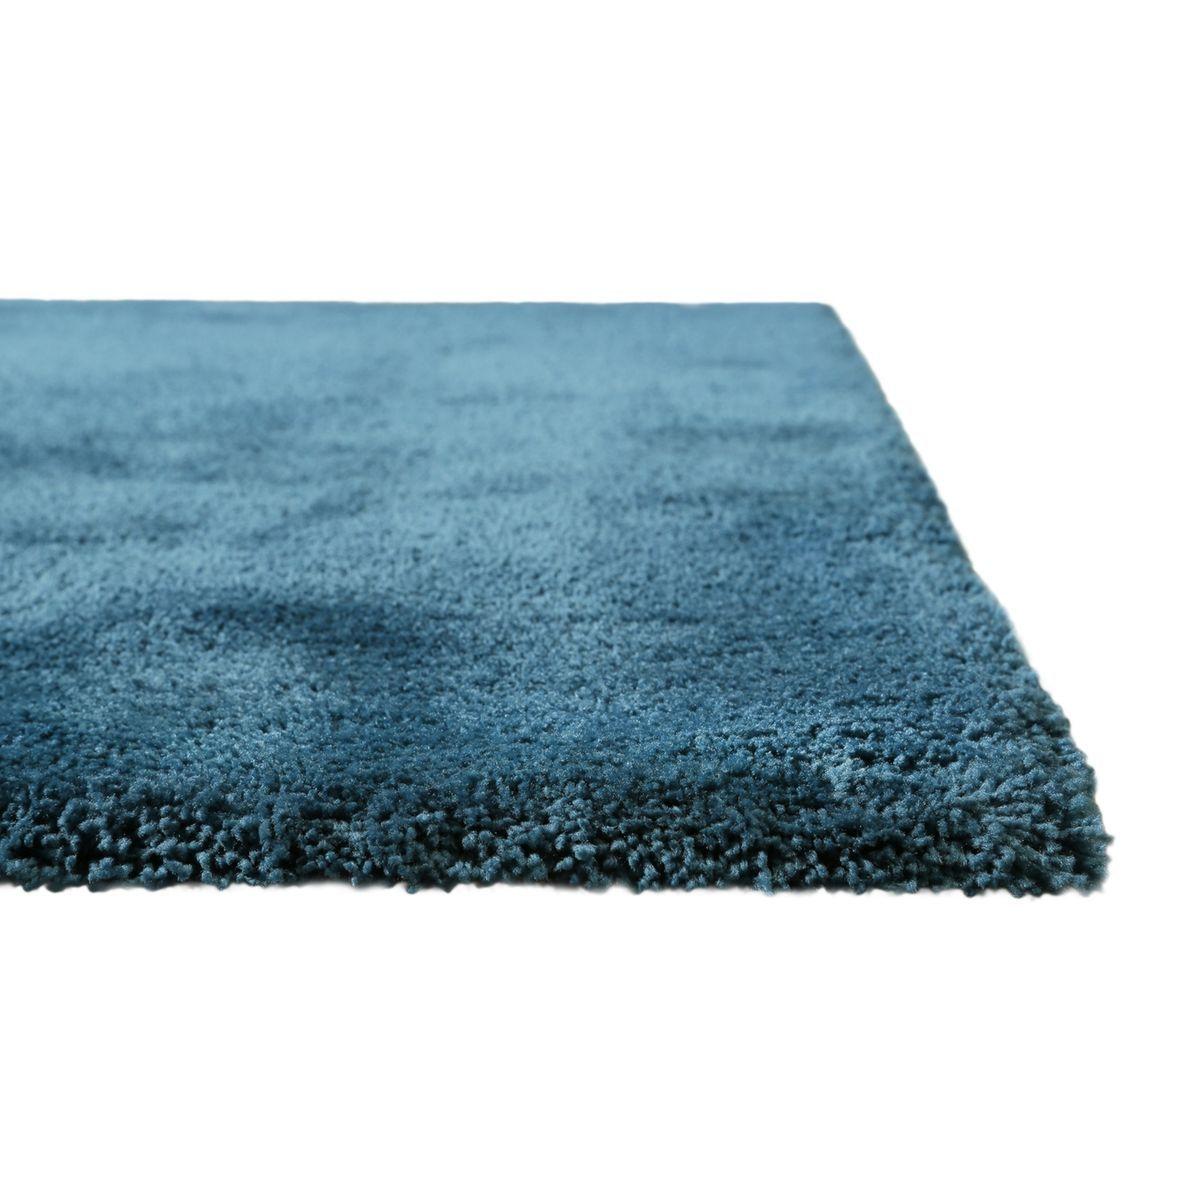 Tapis Sur Chauffage Au Sol tapis pisa | tapis, chauffage au sol et tapis tissé